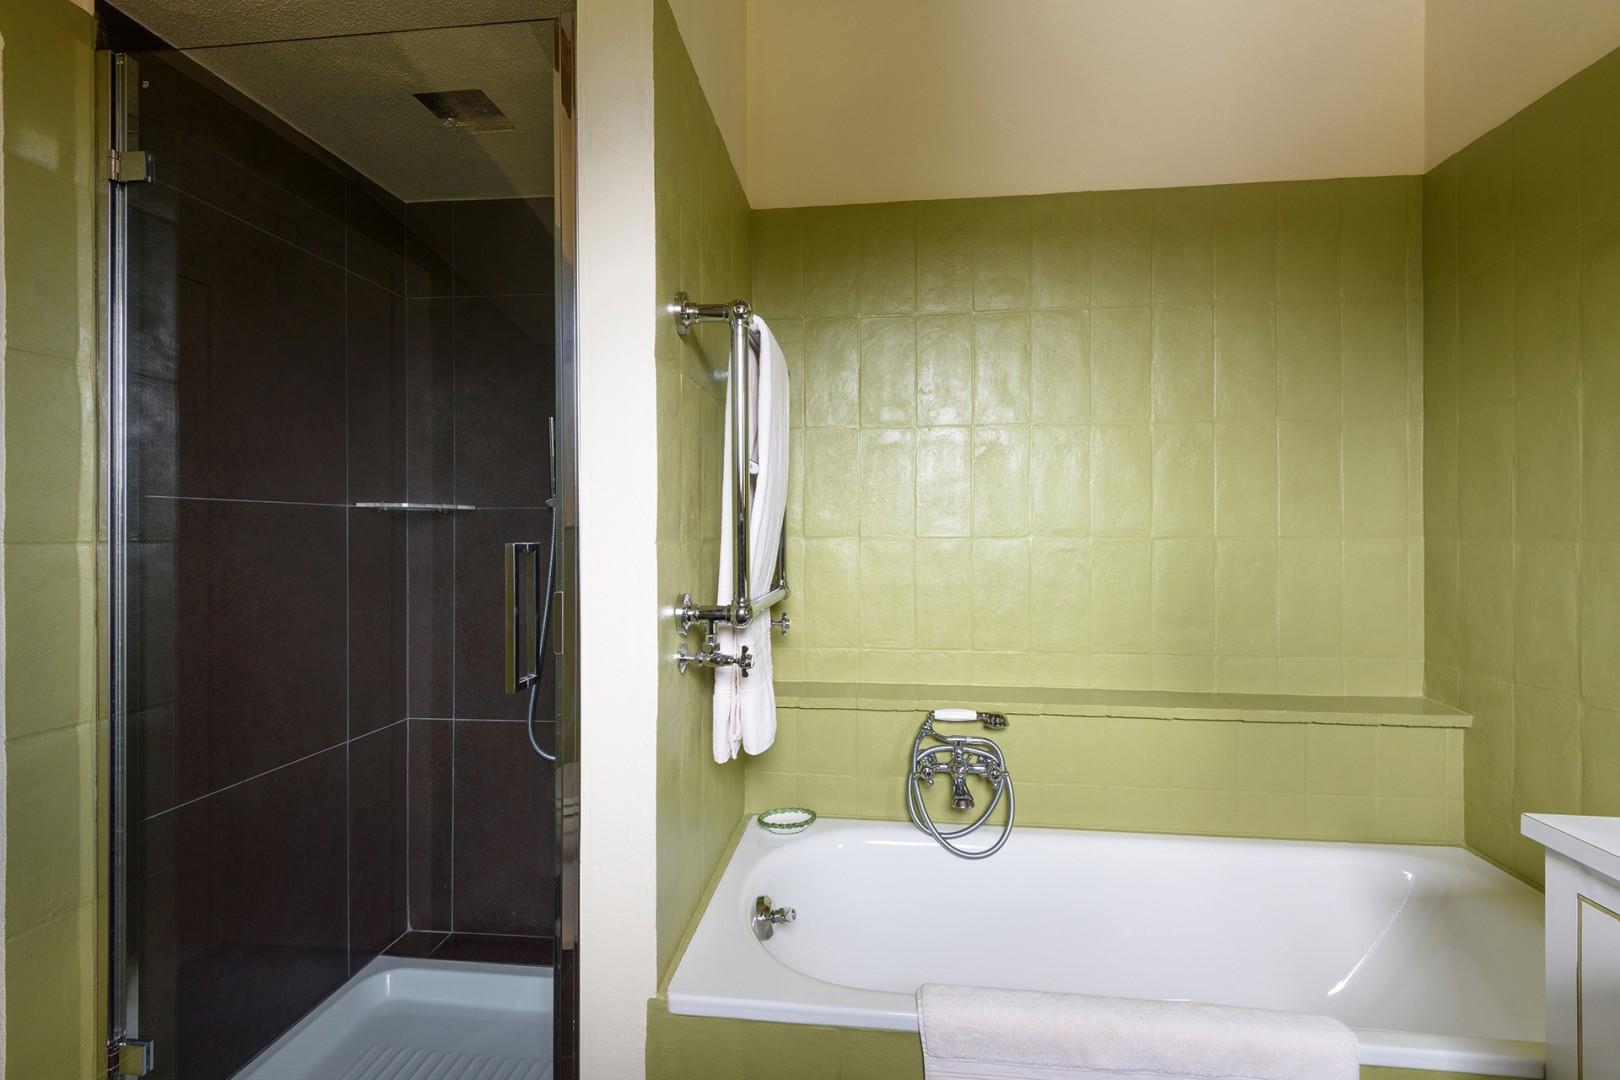 En suite bathroom with bedroom 4 has bathtub and separate shower.